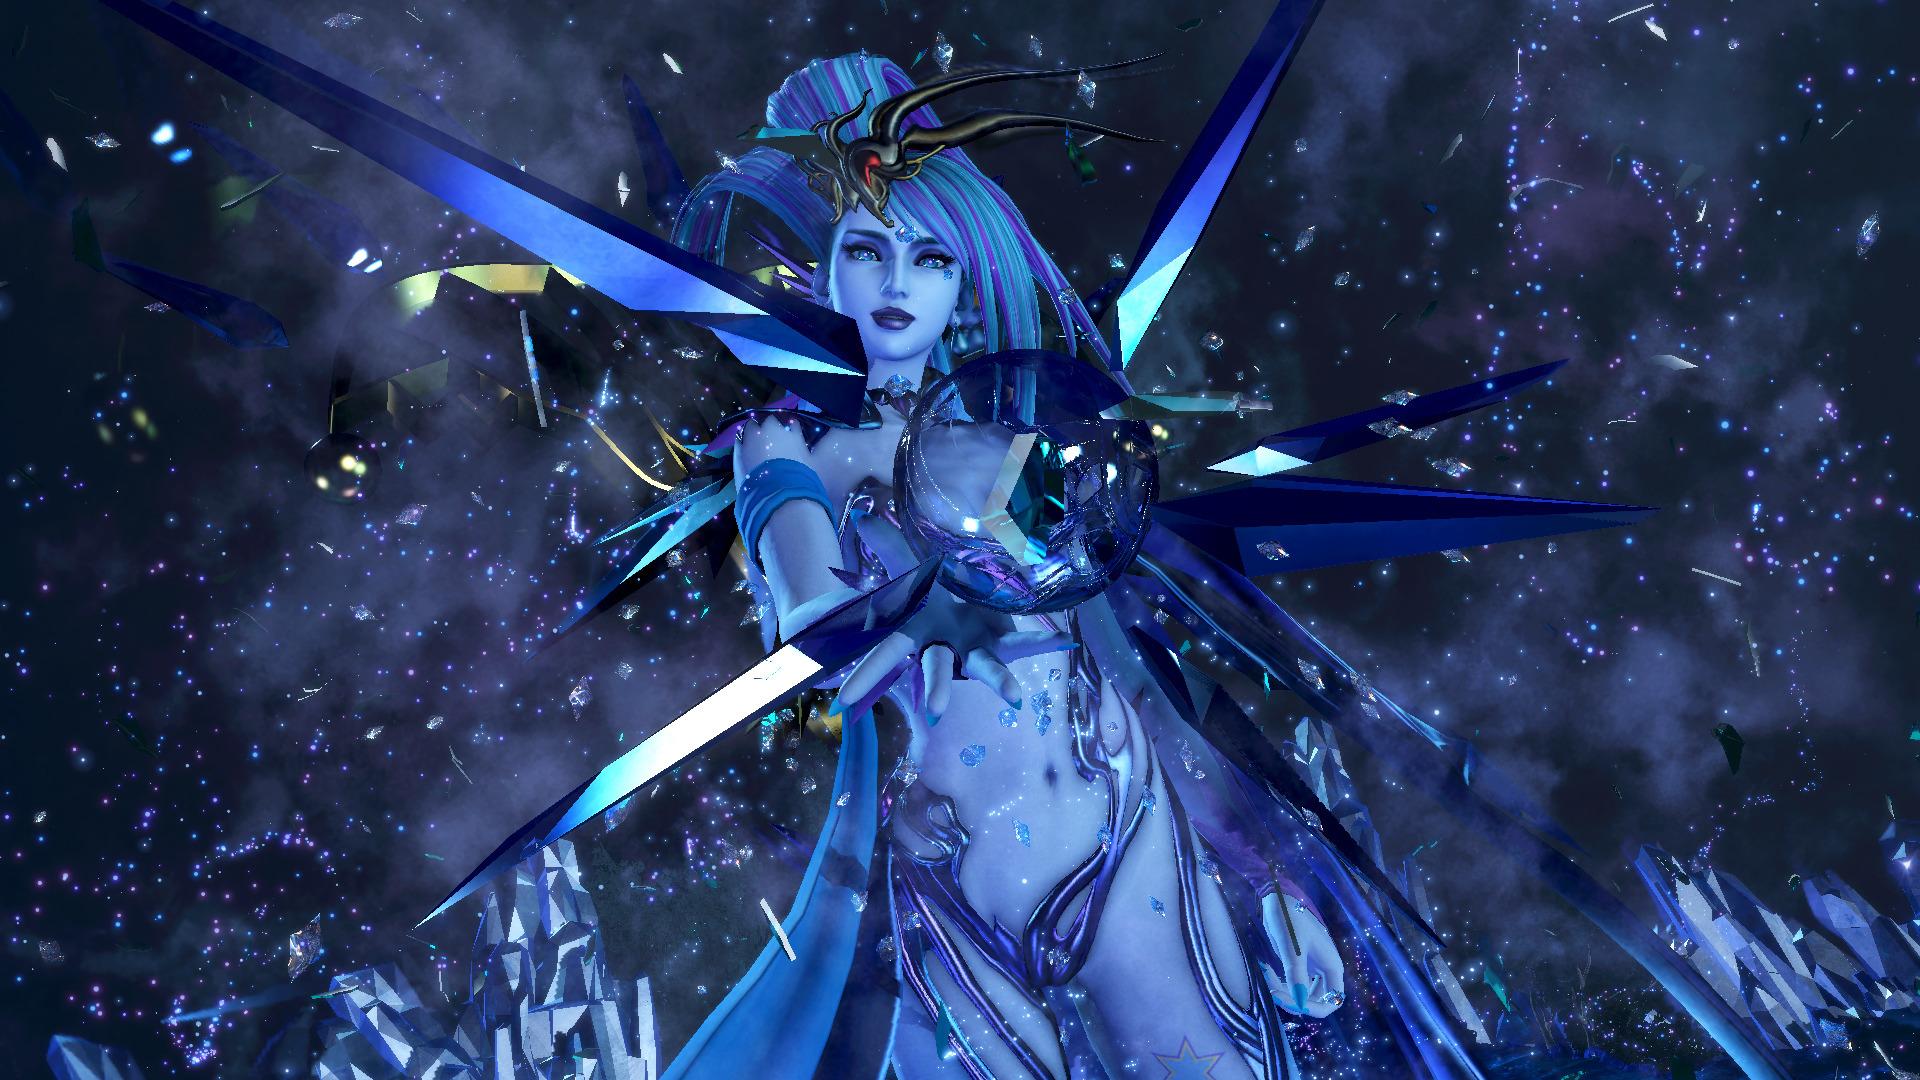 Download 1920x1080 Wallpaper Dissidia Final Fantasy Nt Fantasy